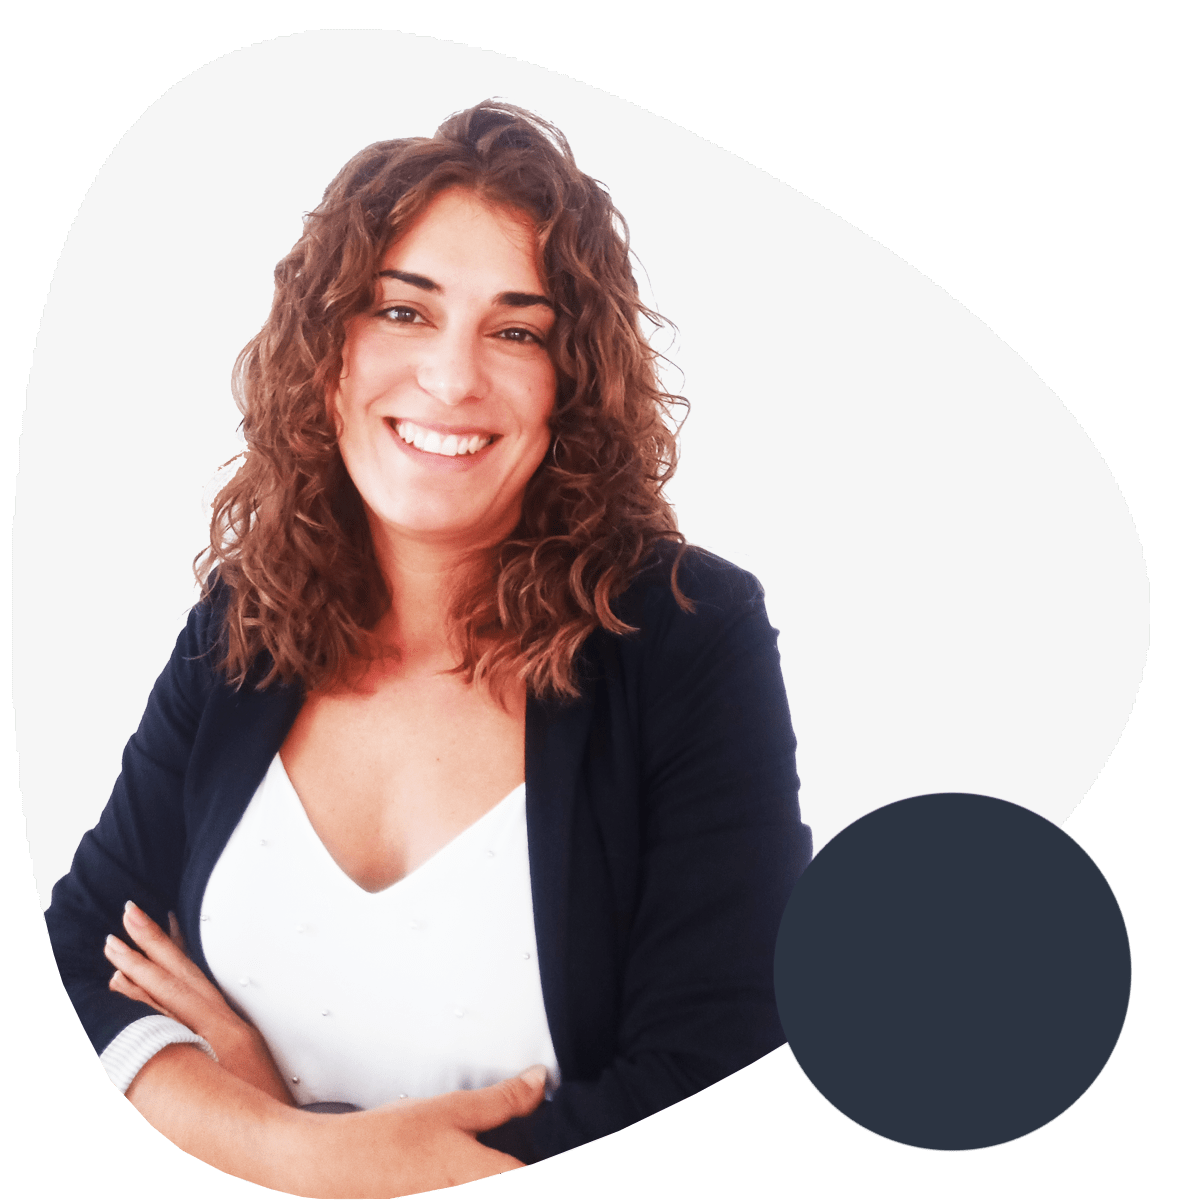 https://takeatip.es/wp-content/uploads/2021/09/Lidia_Luque_empleado.png